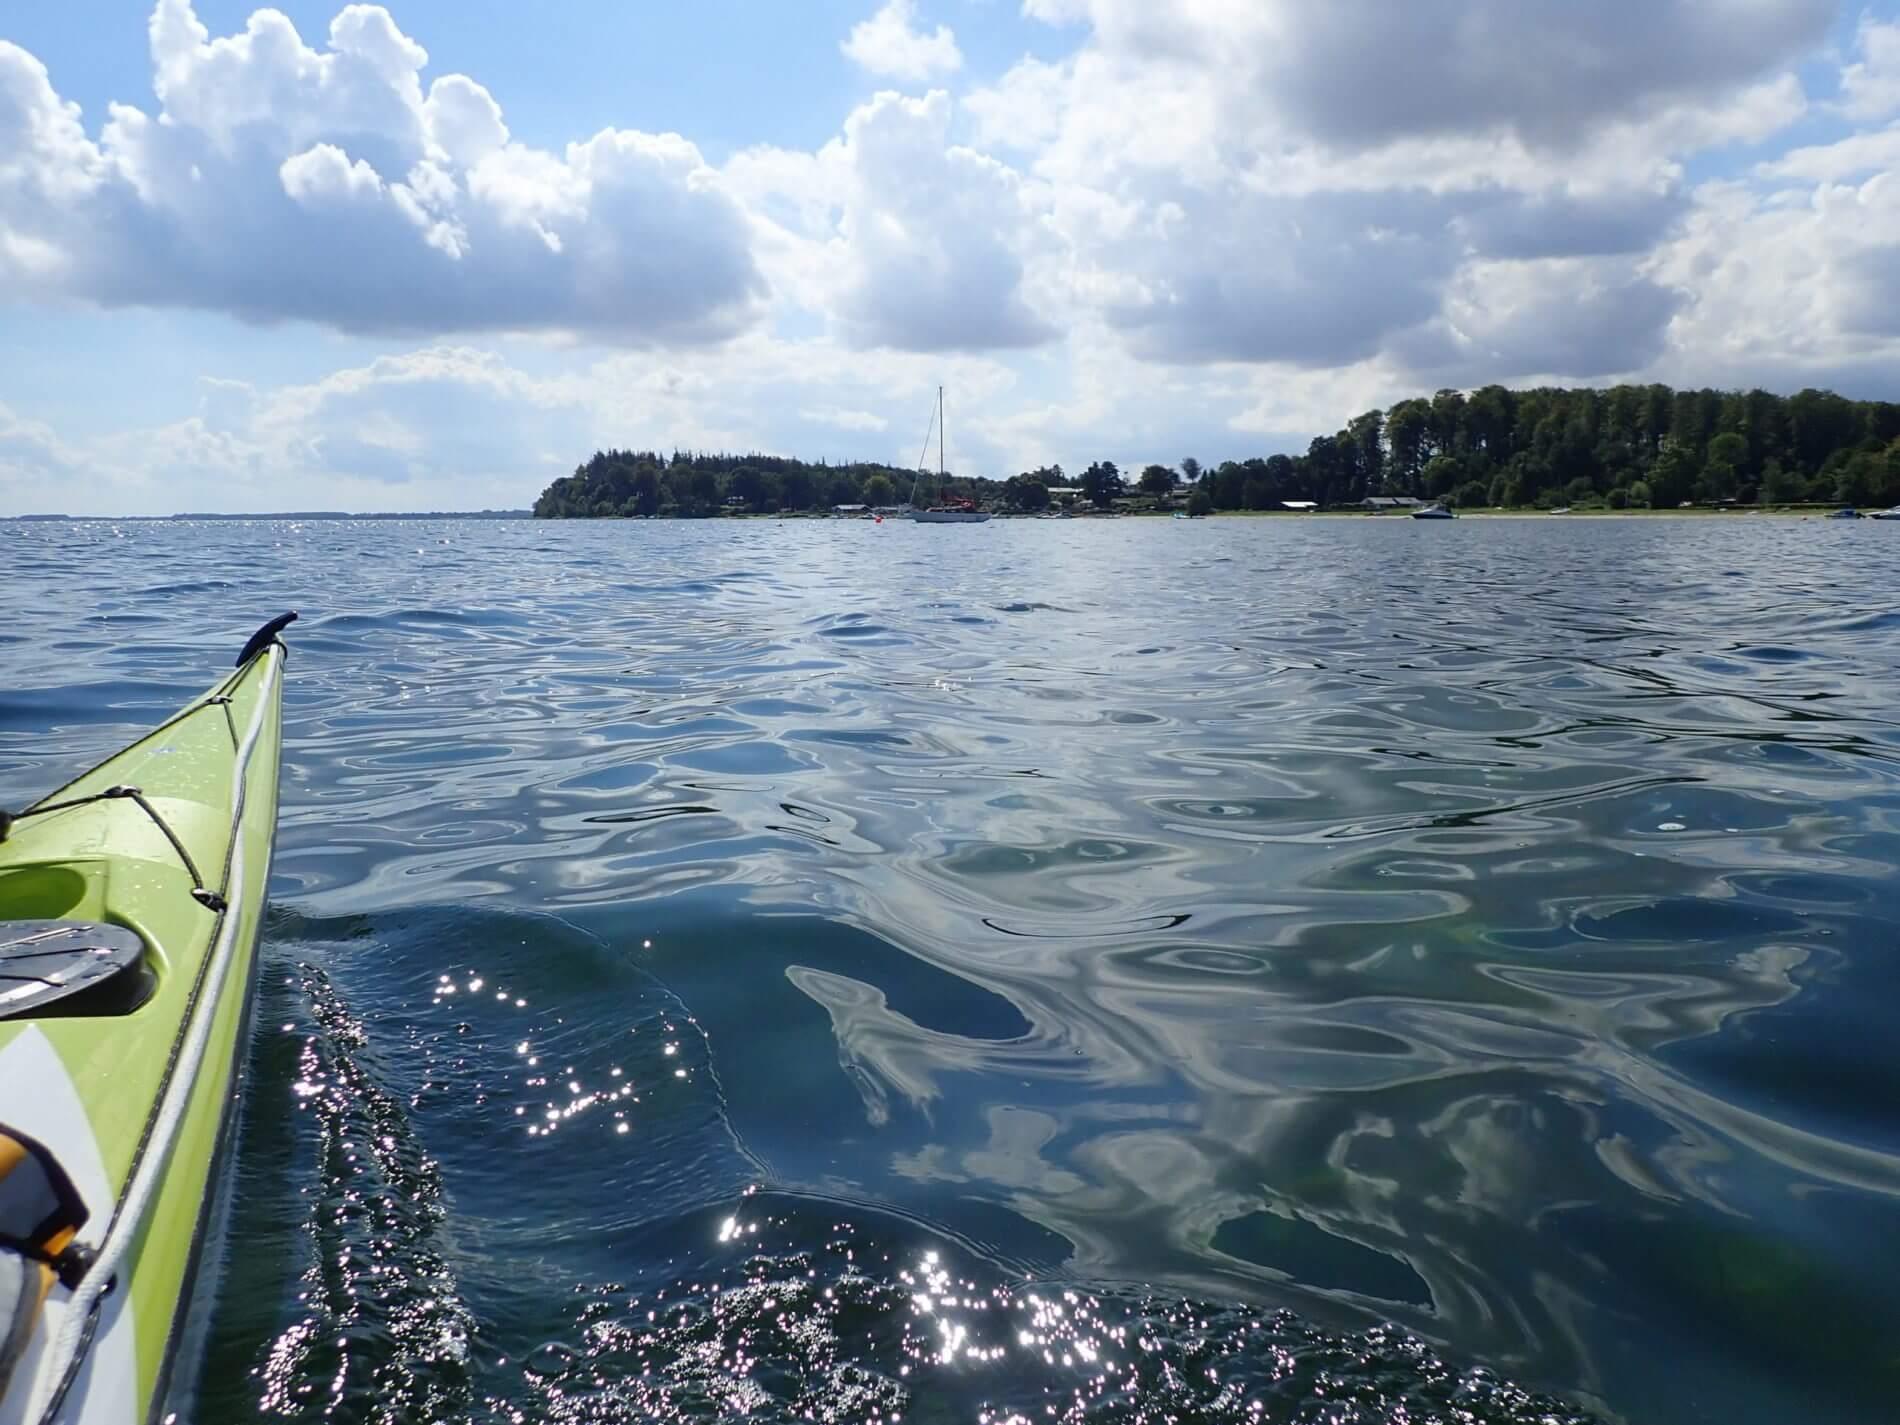 Seekajaktour im Kleinen Belt_Dänemark